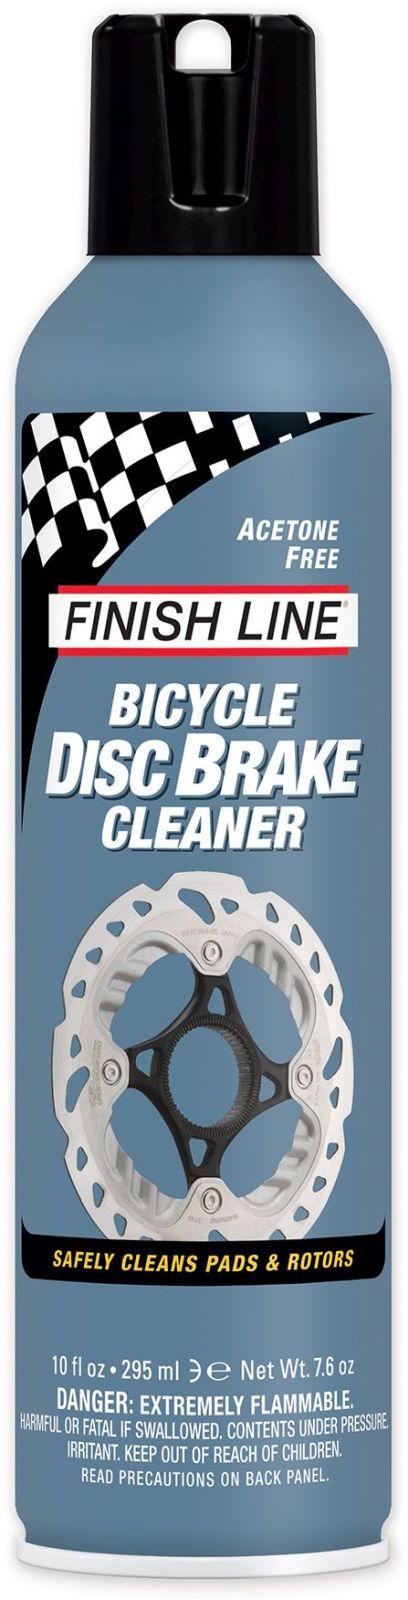 Finish Line Disc Brake Cleaner 295 ml uni